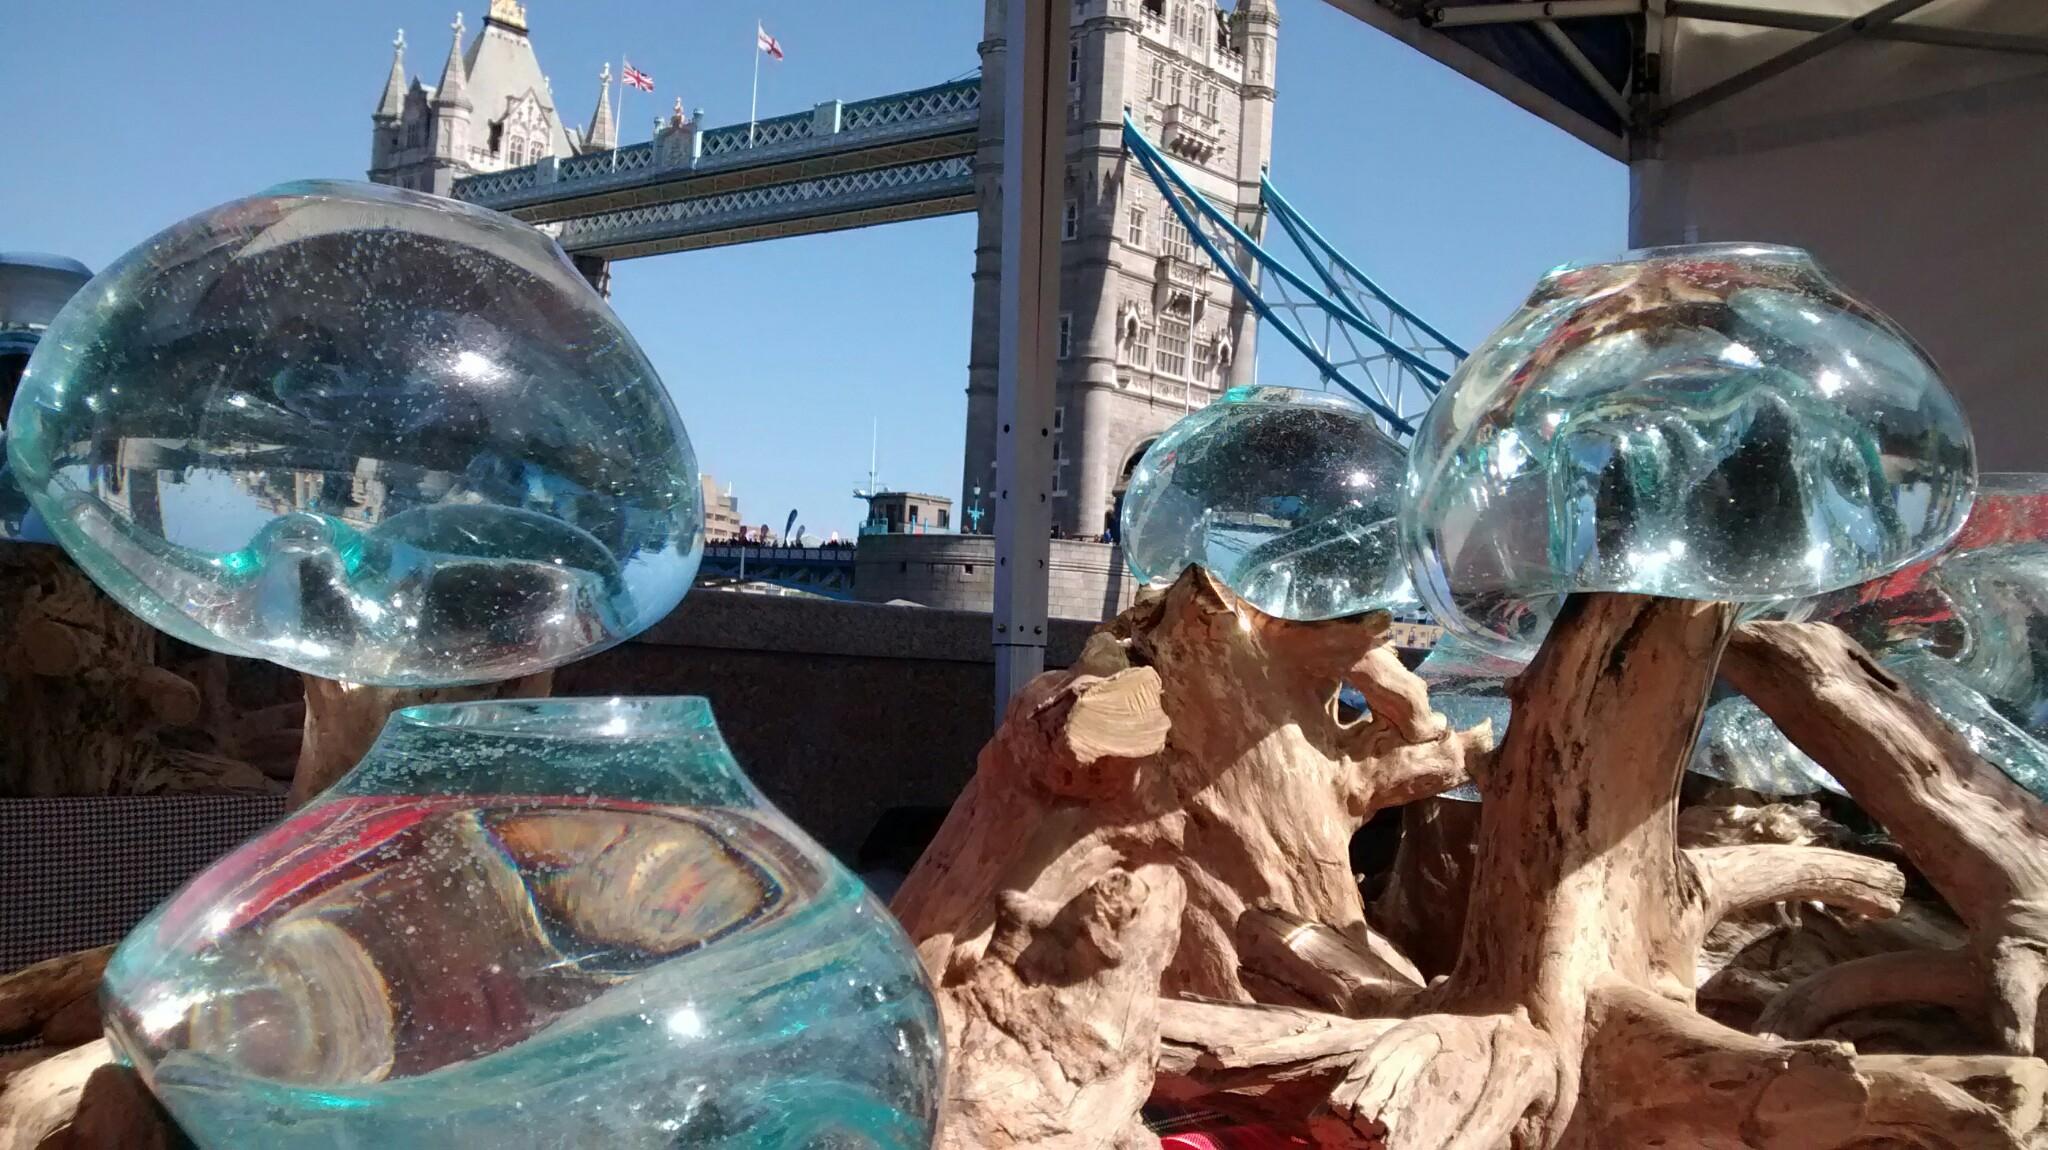 Aliens attack London bridge 2014